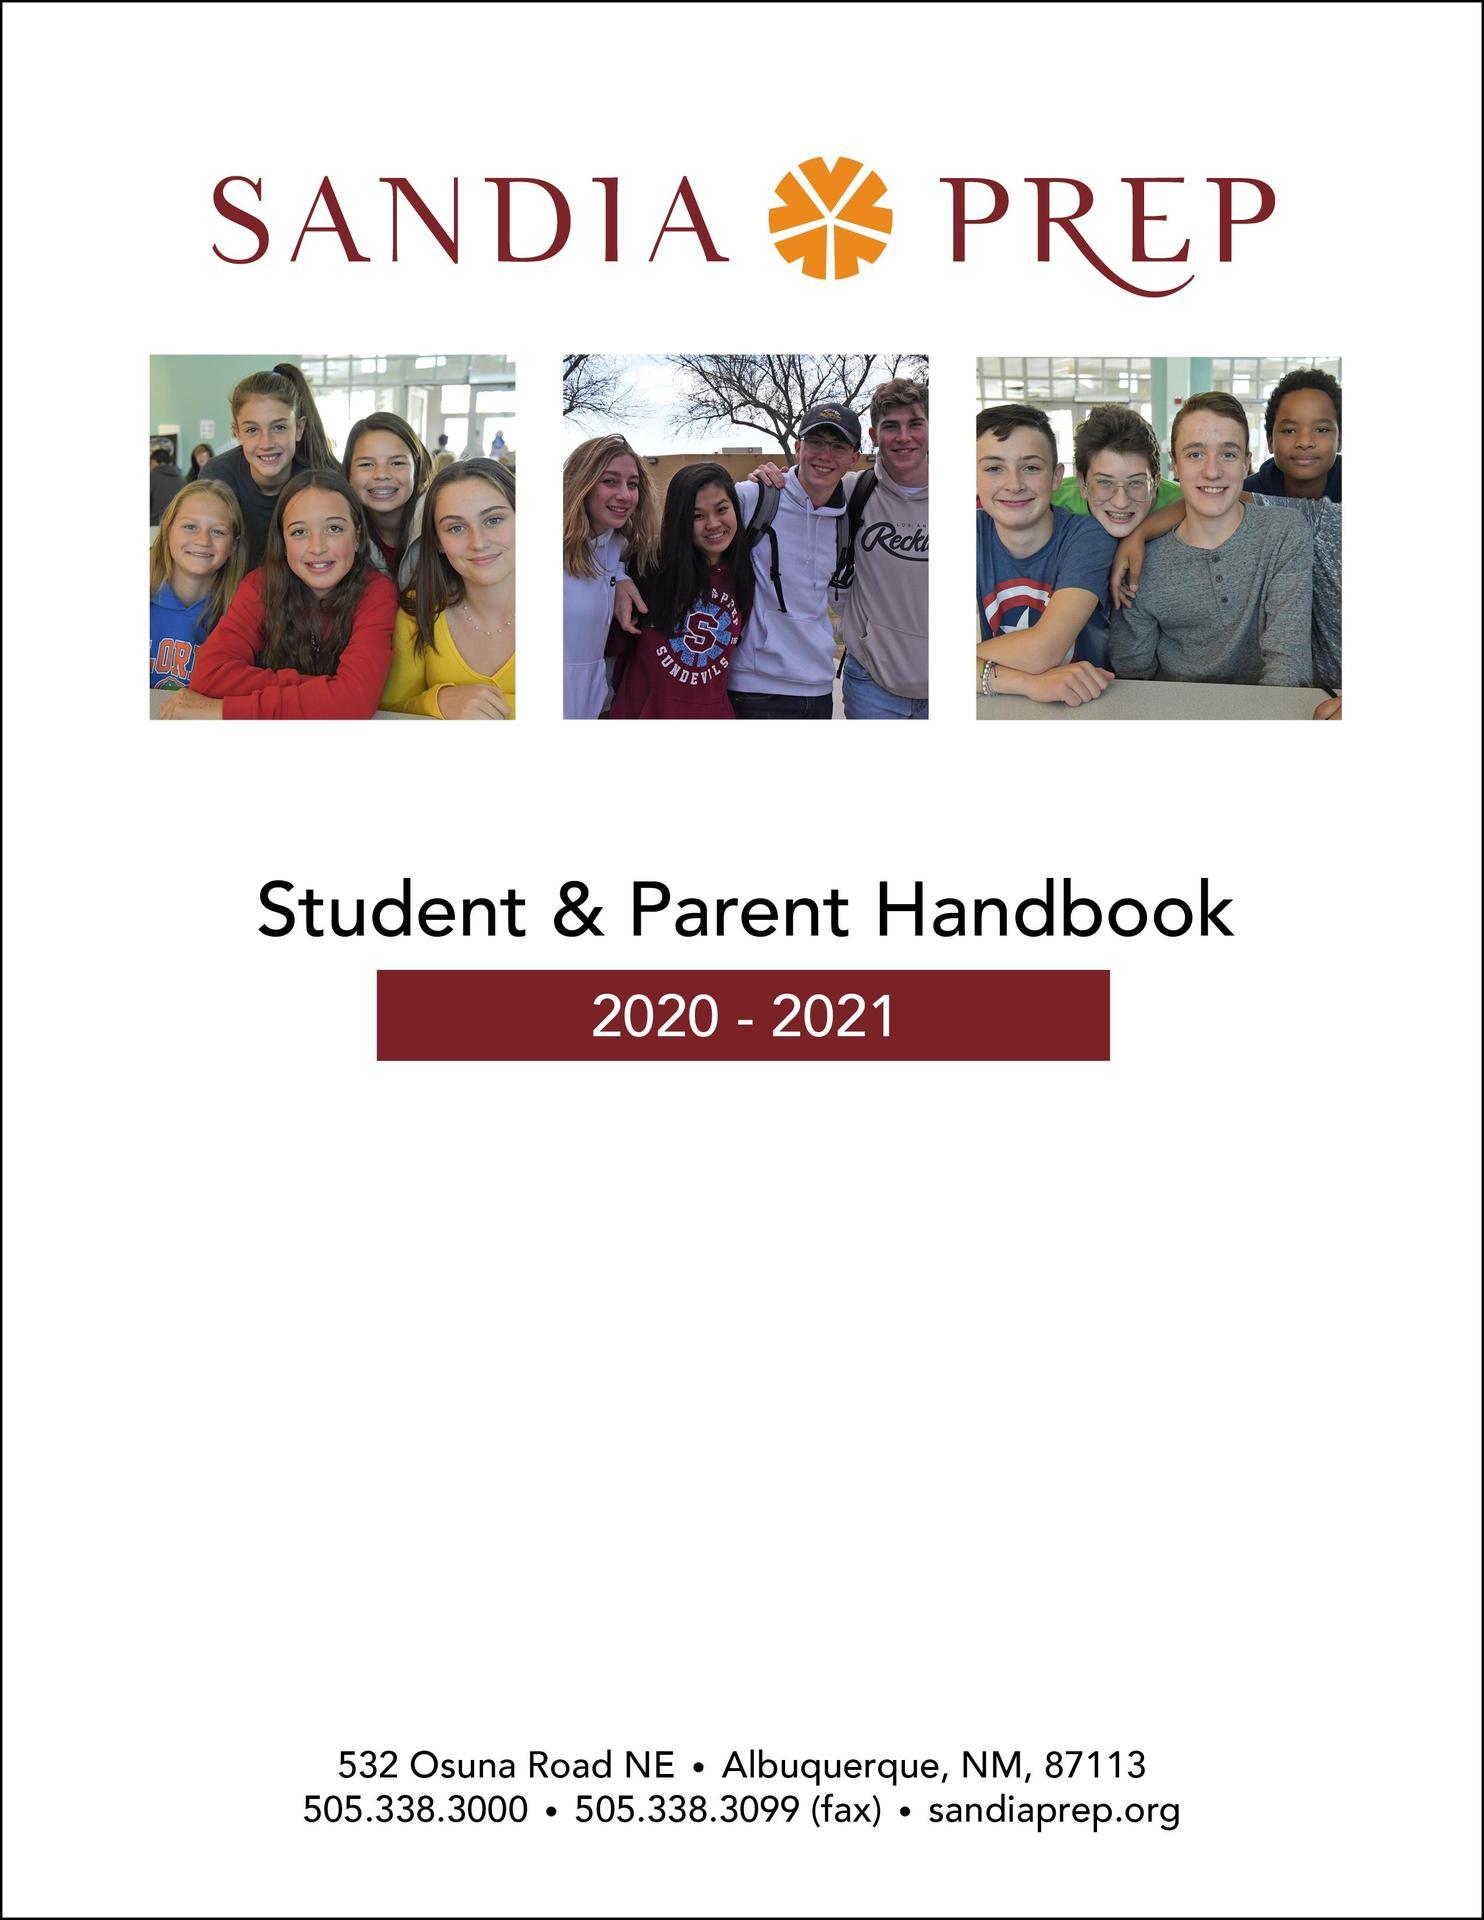 2020 - 2021 Parent and Student Handbook